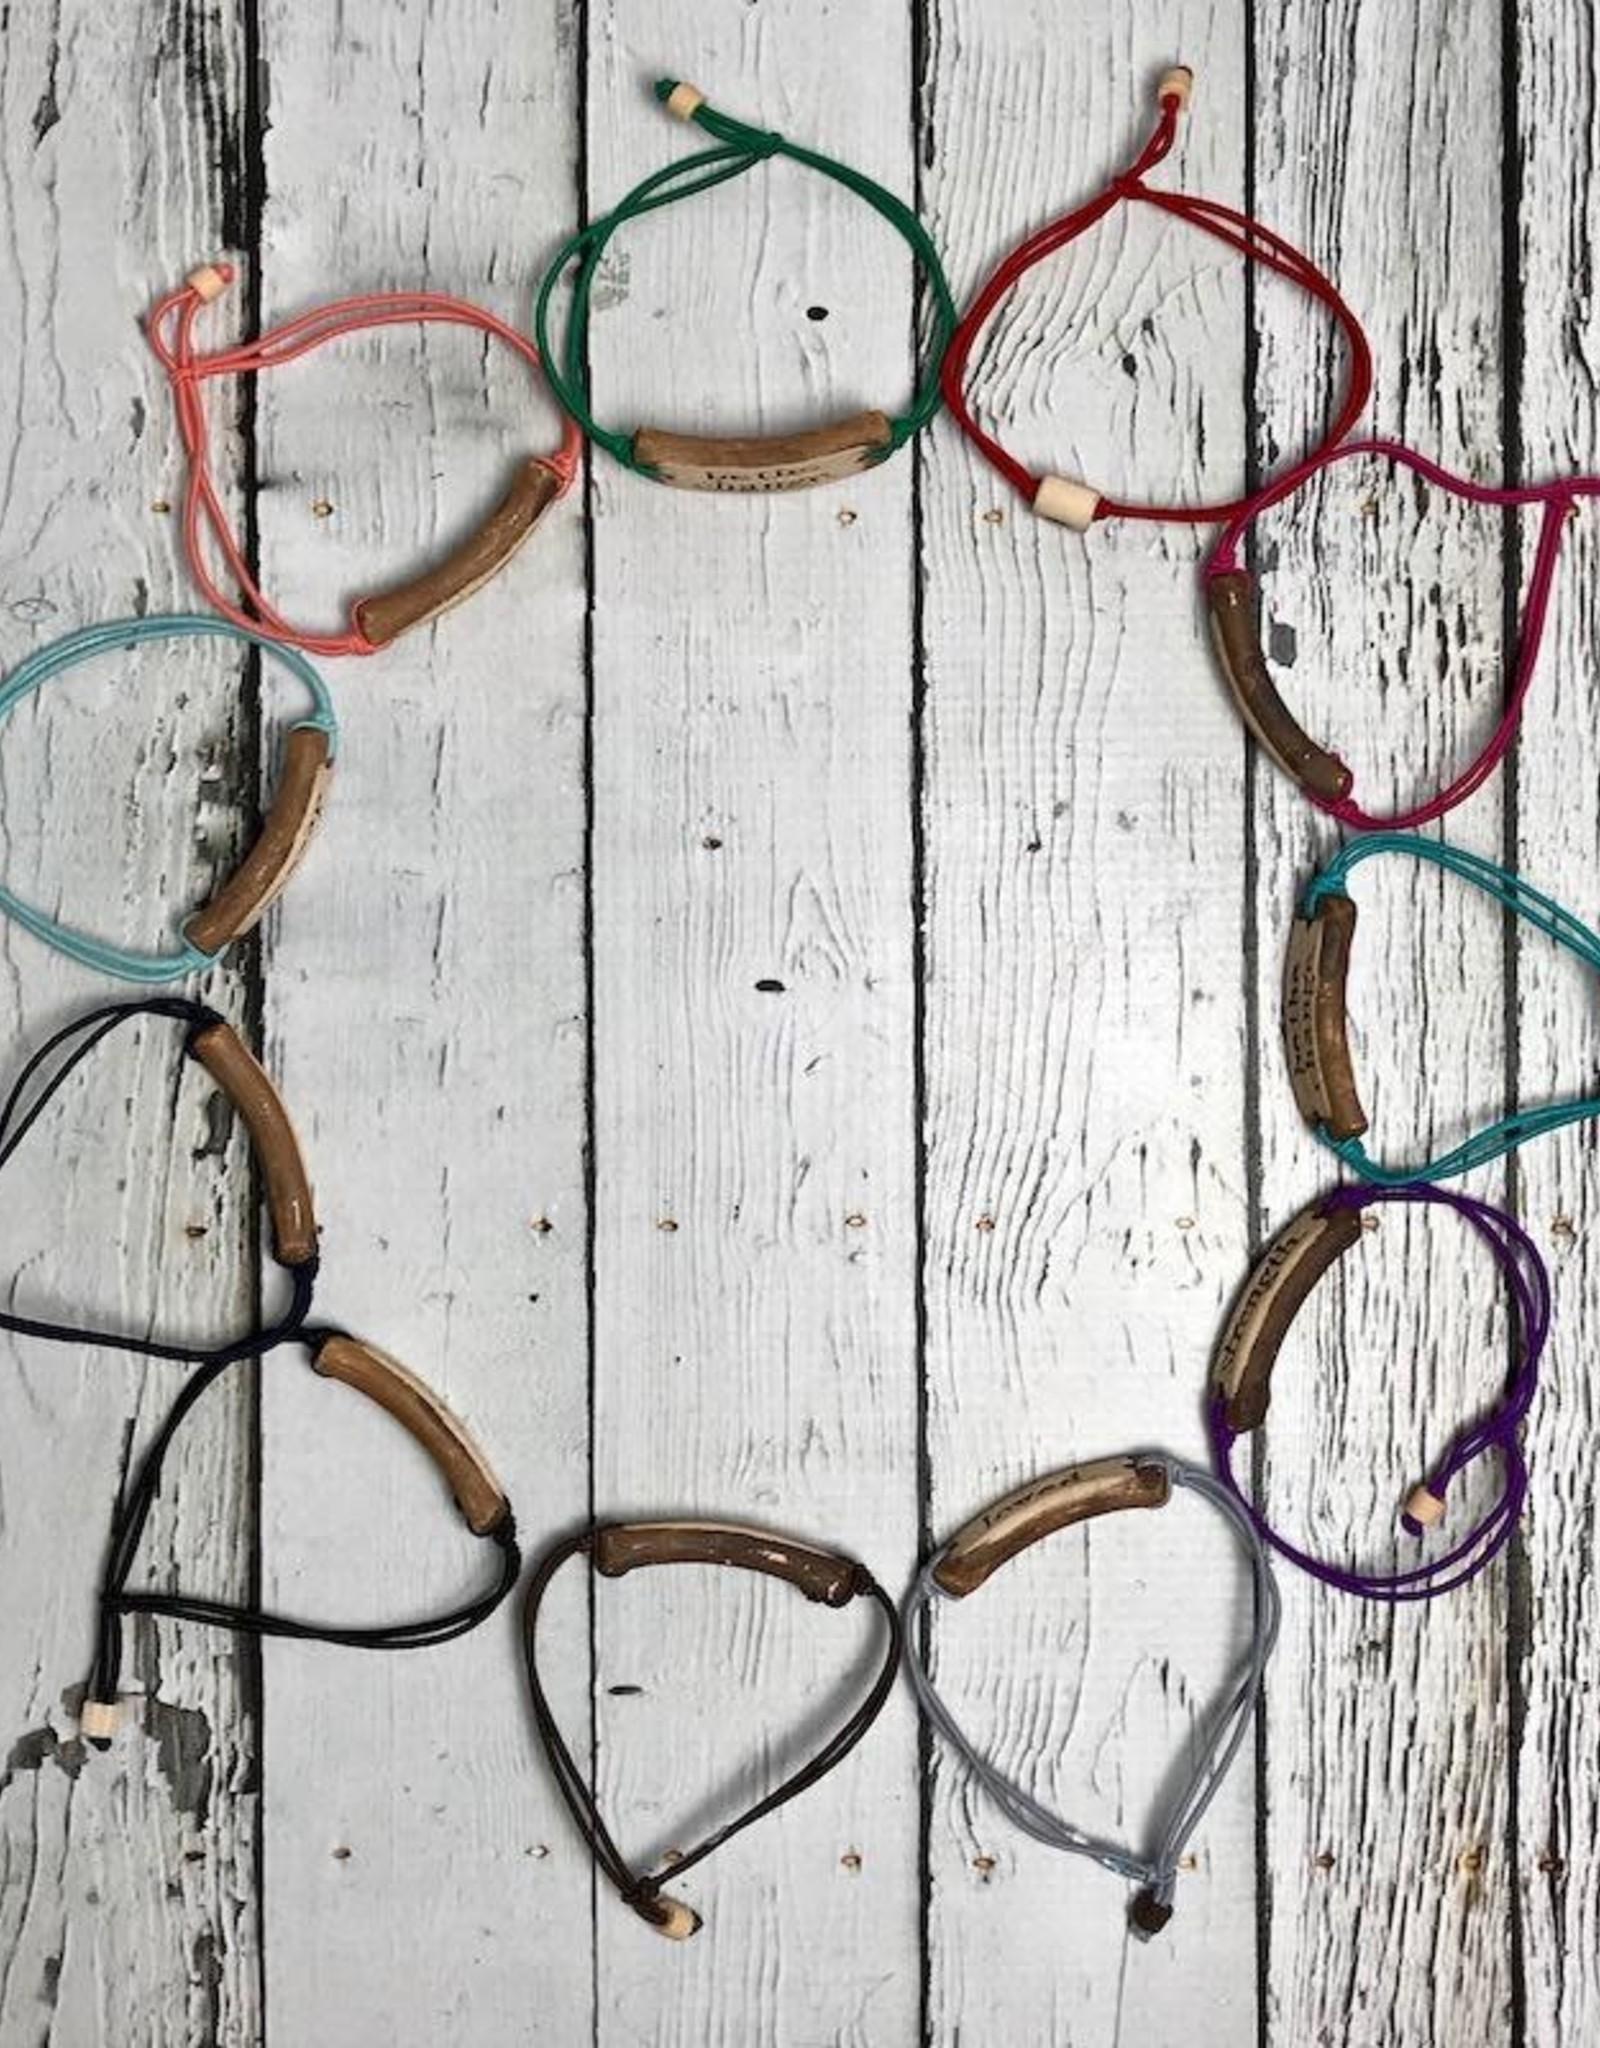 Handmade adjustable Mudlove Bracelet